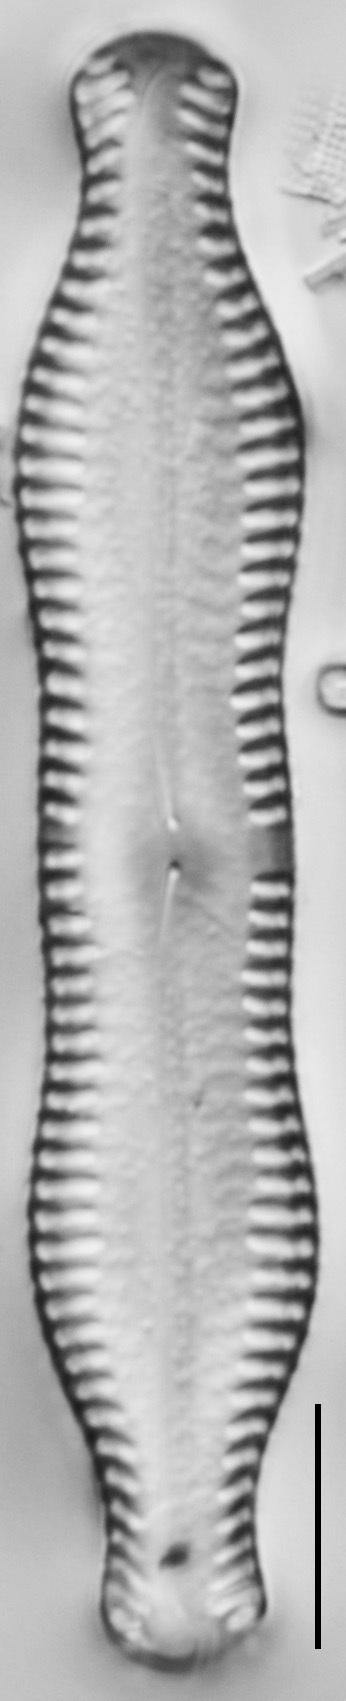 Pinnularia scotica LM7